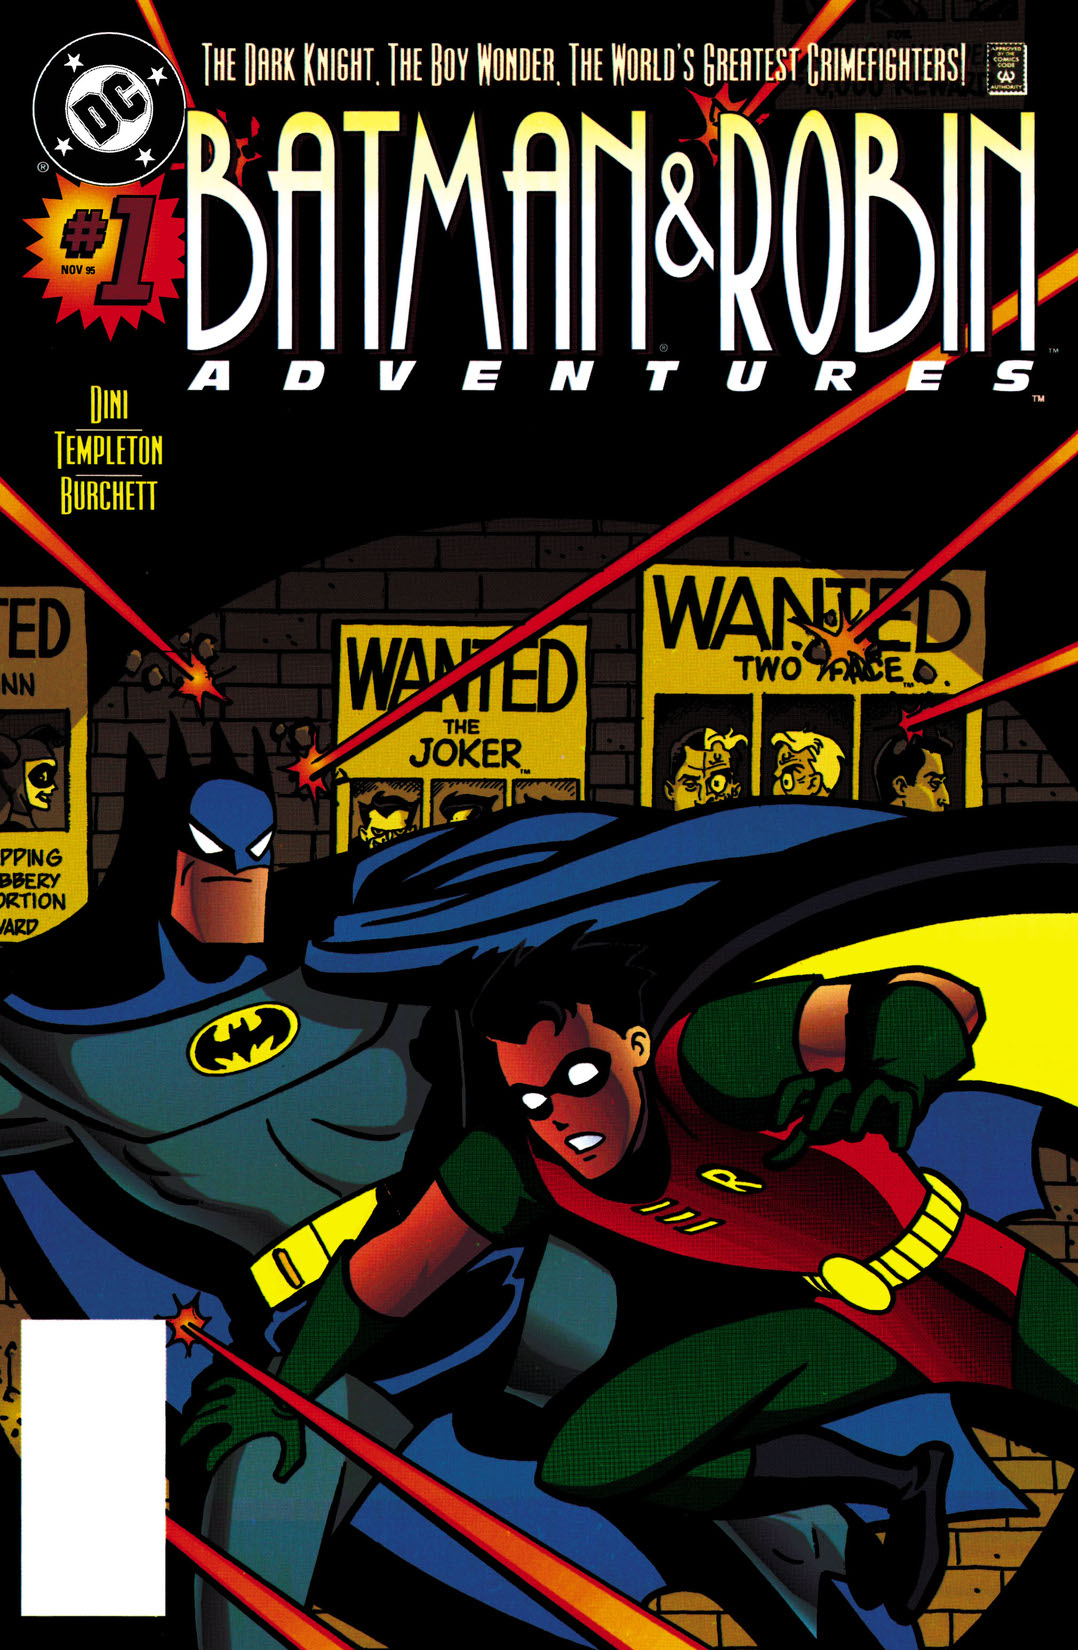 read the batman and robin adventures 1995 1 on dc universe. Black Bedroom Furniture Sets. Home Design Ideas